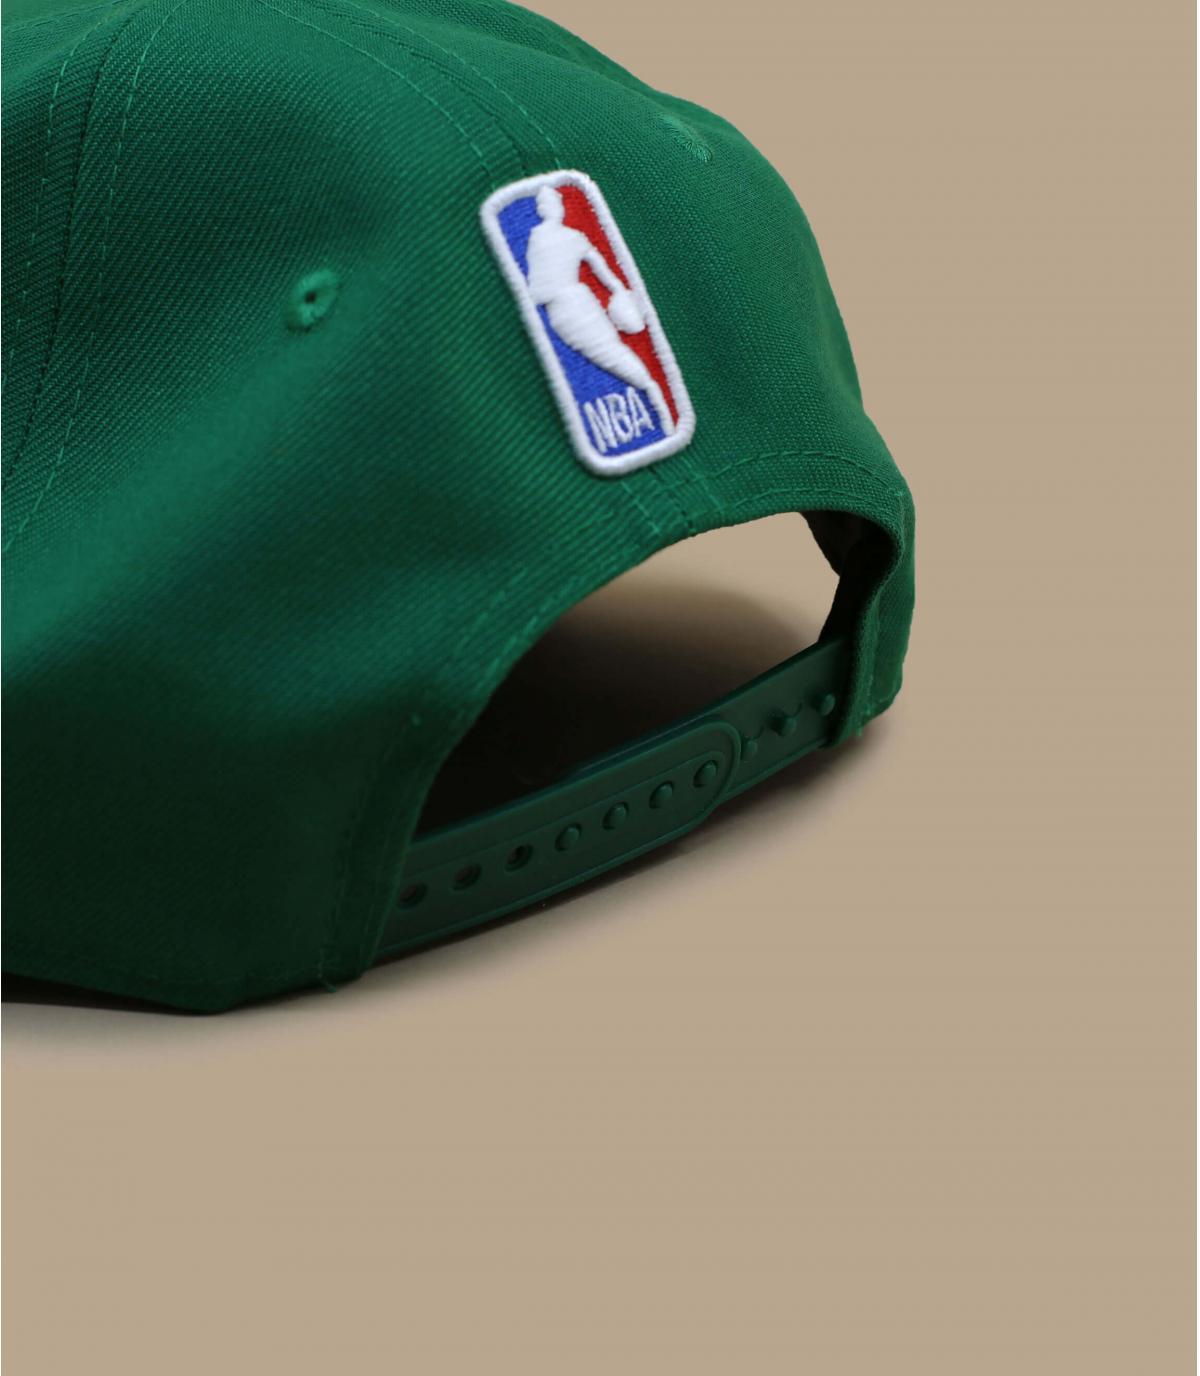 Détails Snapback NBA Draft Celtics 950 - image 4